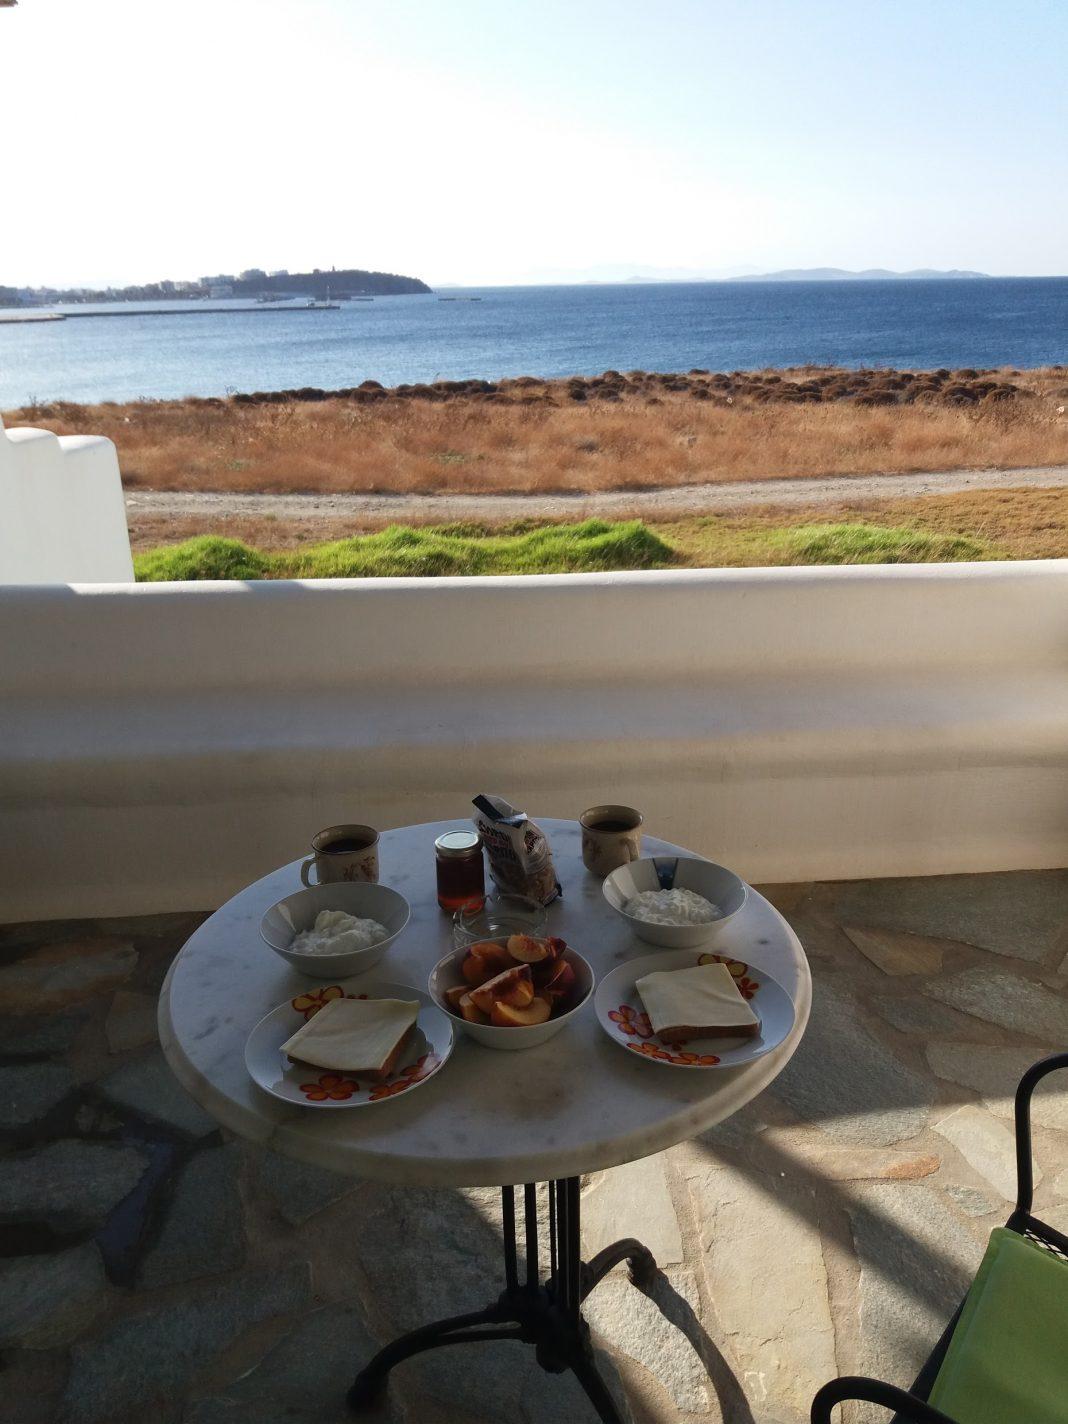 Ontbijtje - Parathyro sto Aigaio 2 - Small Suites